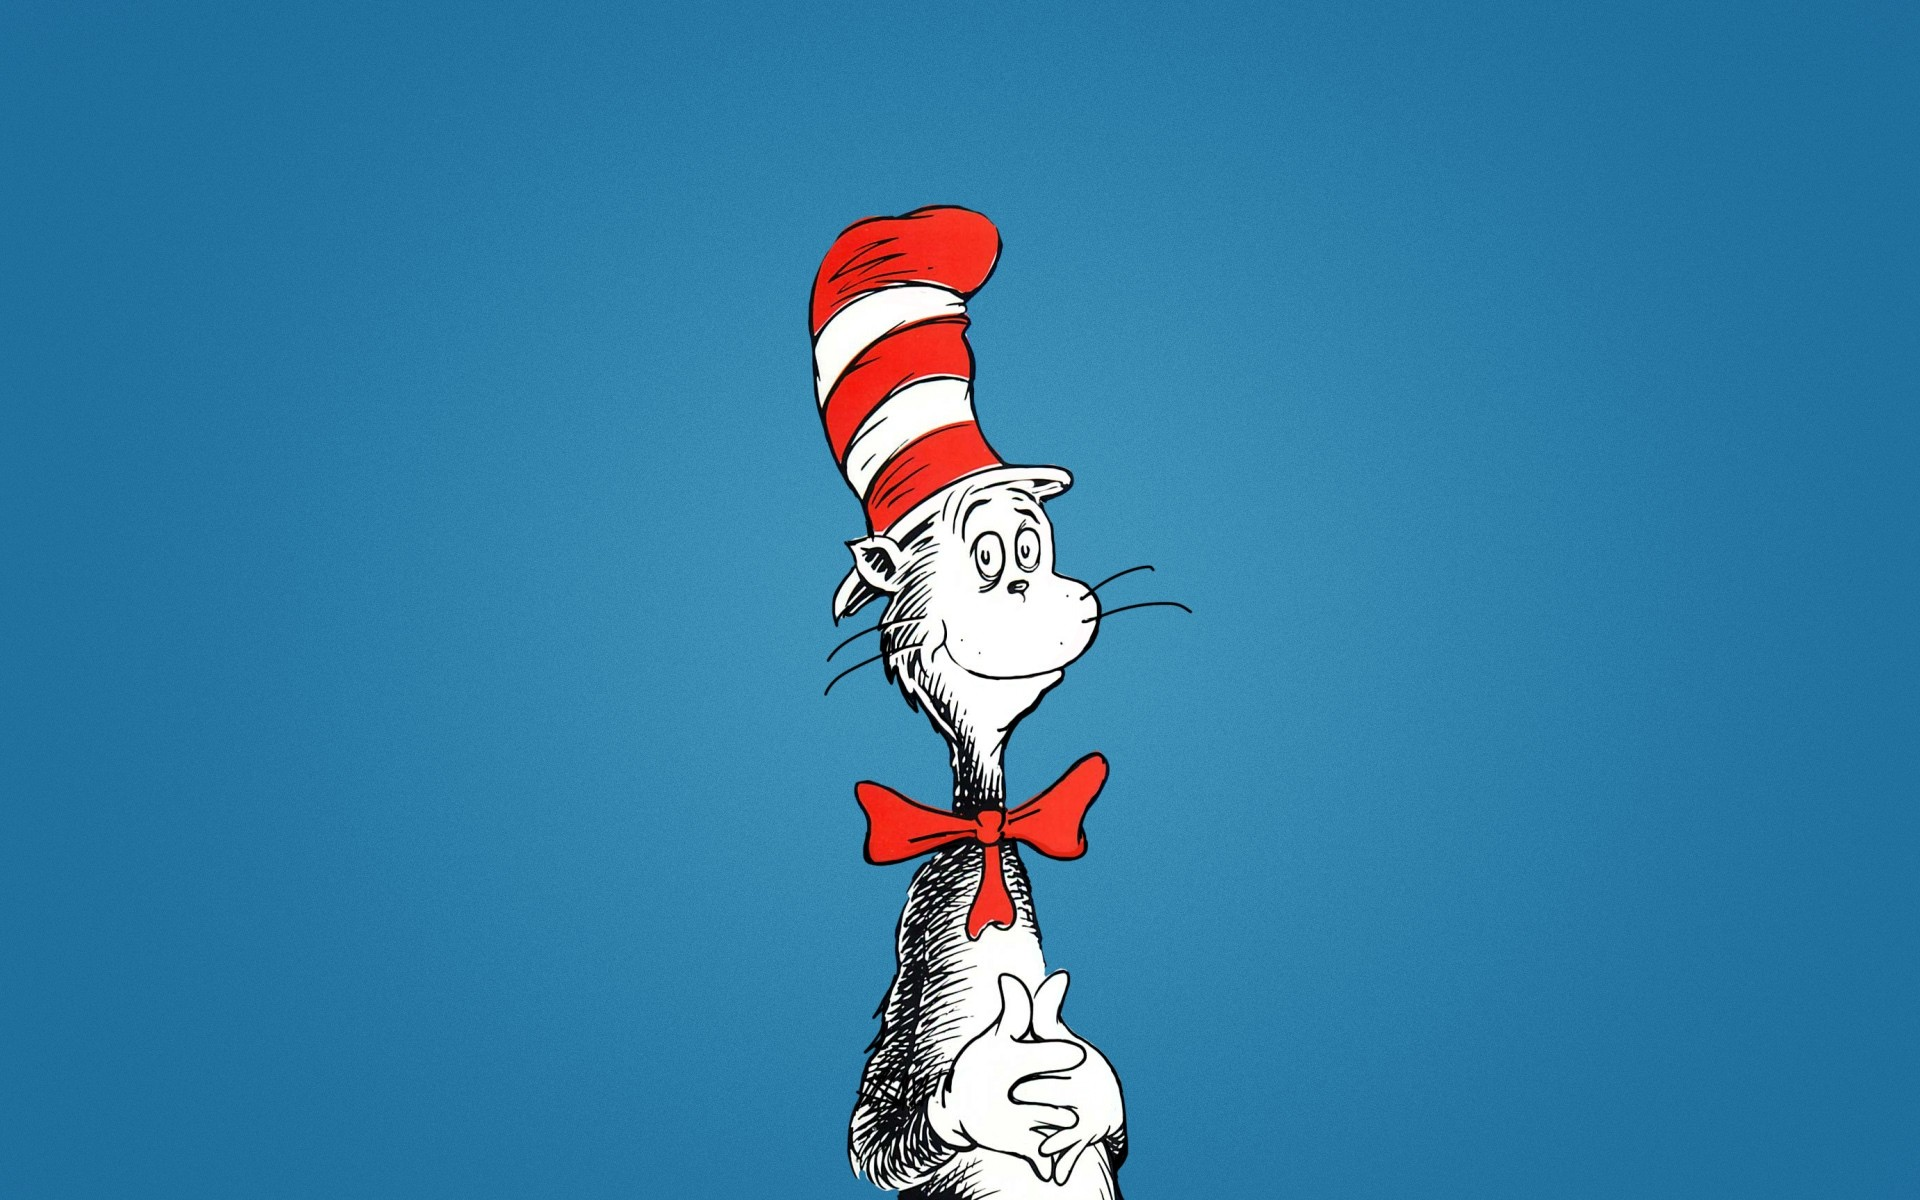 Cat in the hat wallpaper 71 images - Dr seuss wallpaper ...